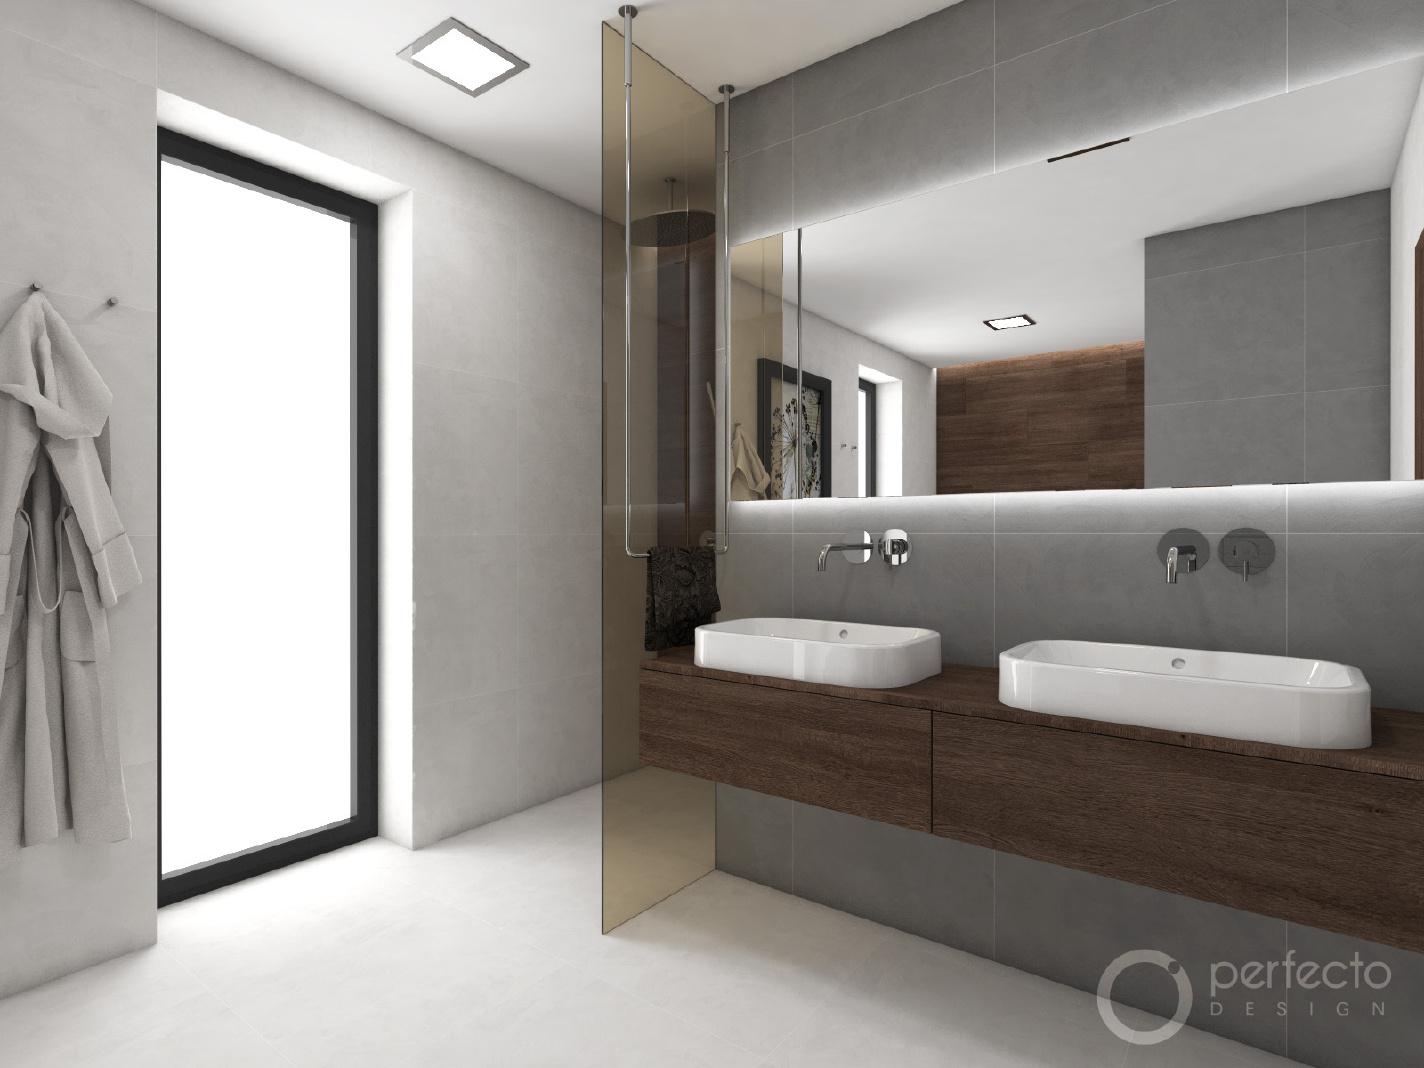 Modern koupelna chloe perfecto design for Moderne badezimmergestaltung